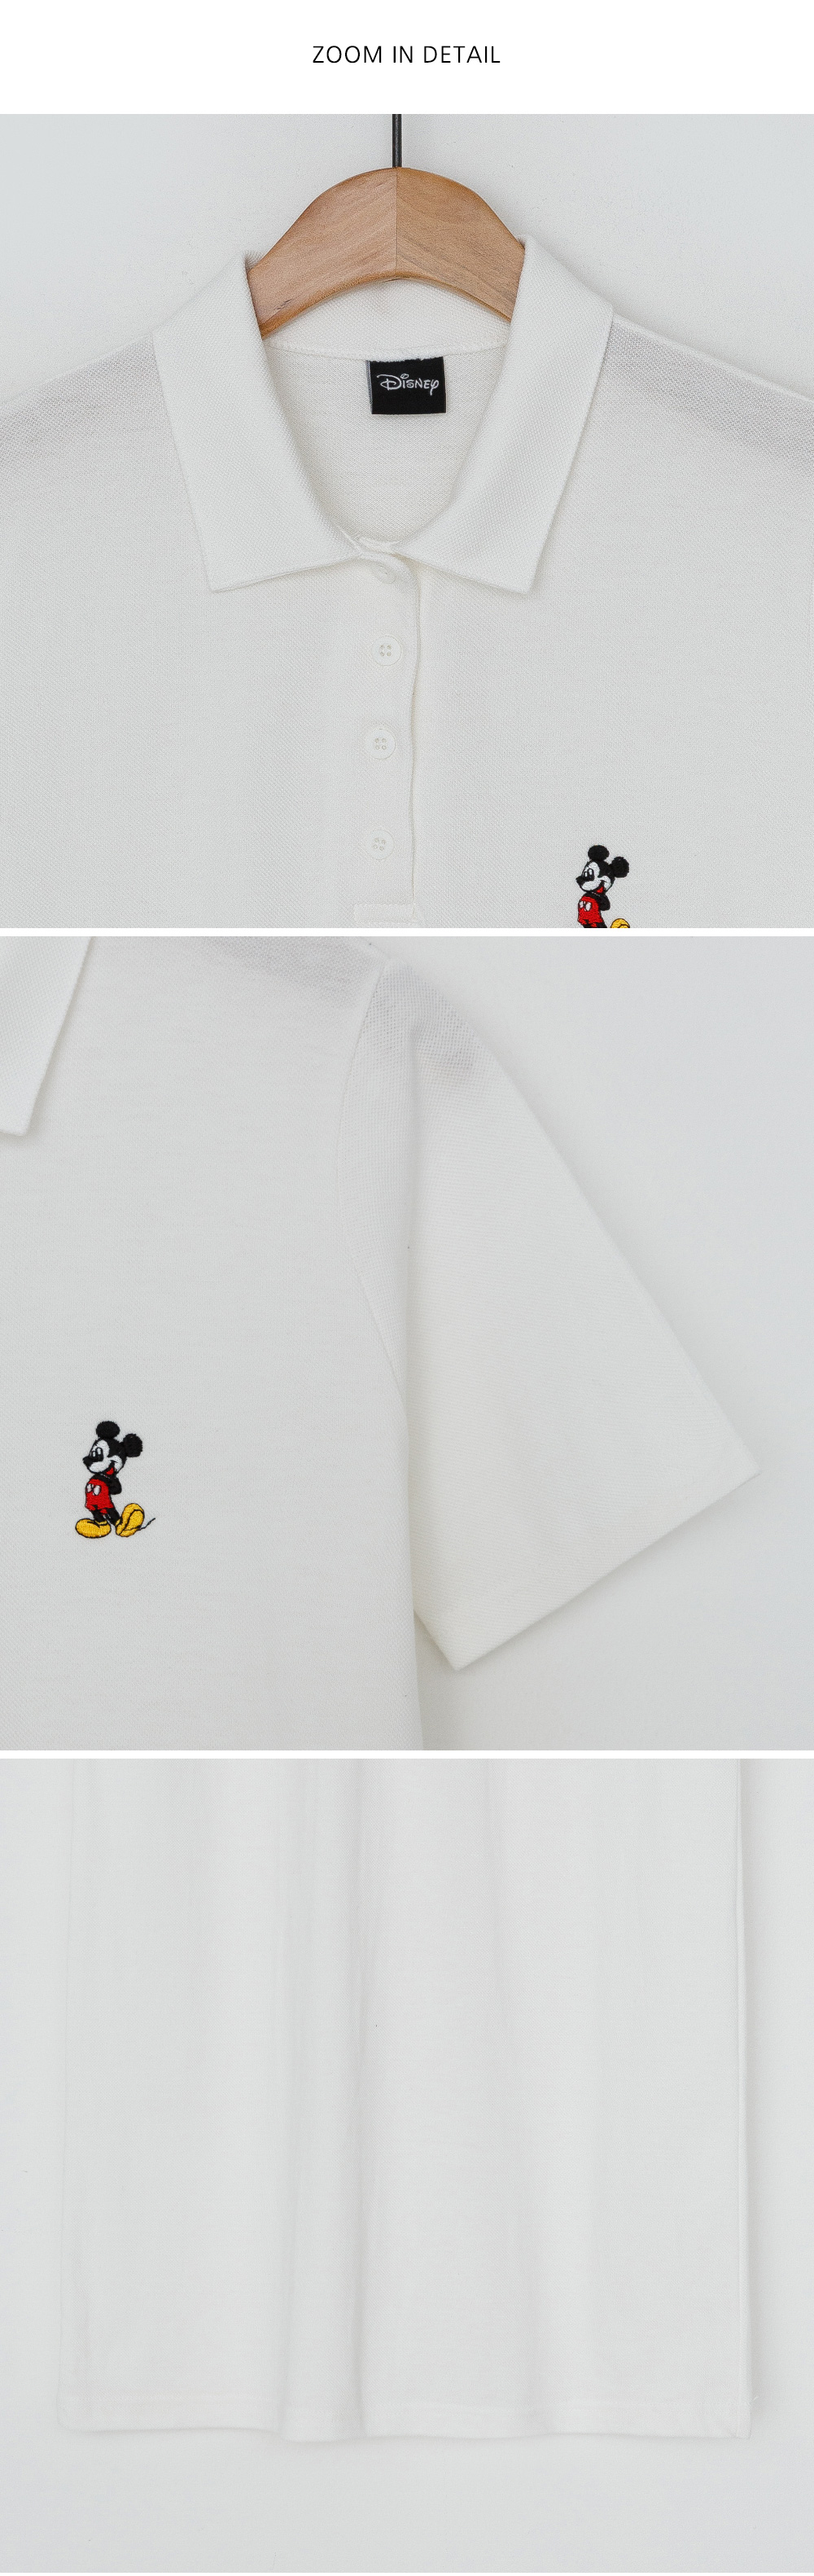 Mickey embroidery color midi dress